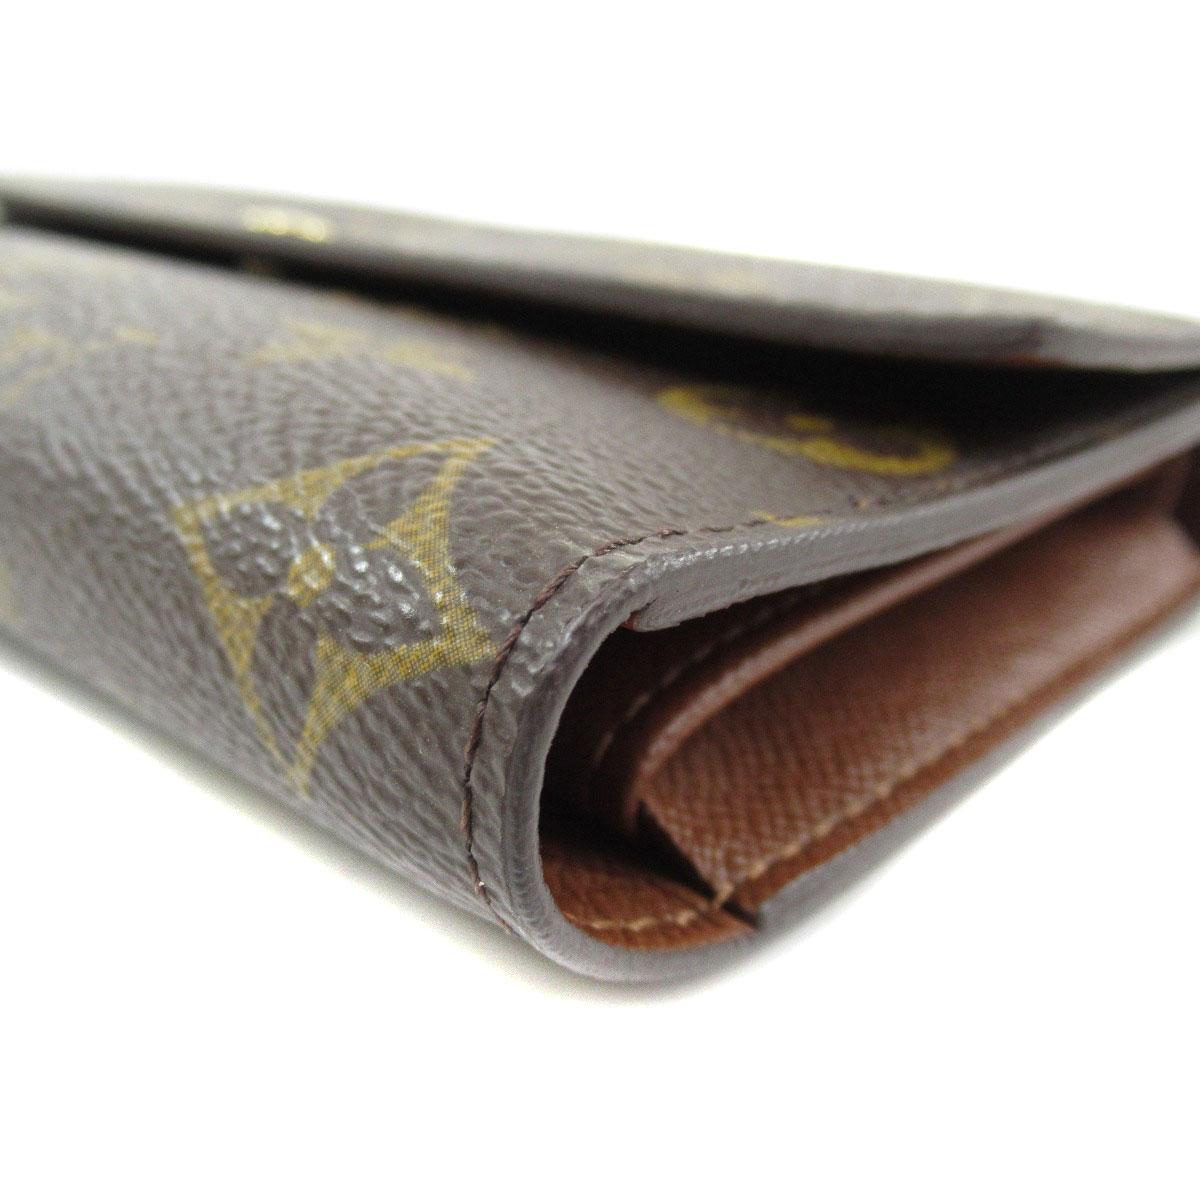 45b40788bae0 ... LOUIS VUITTON M61217 ポルトフォイユ インターナショナル 三つ折り 長財布(小銭入れあり) モノグラムキャンバス ...